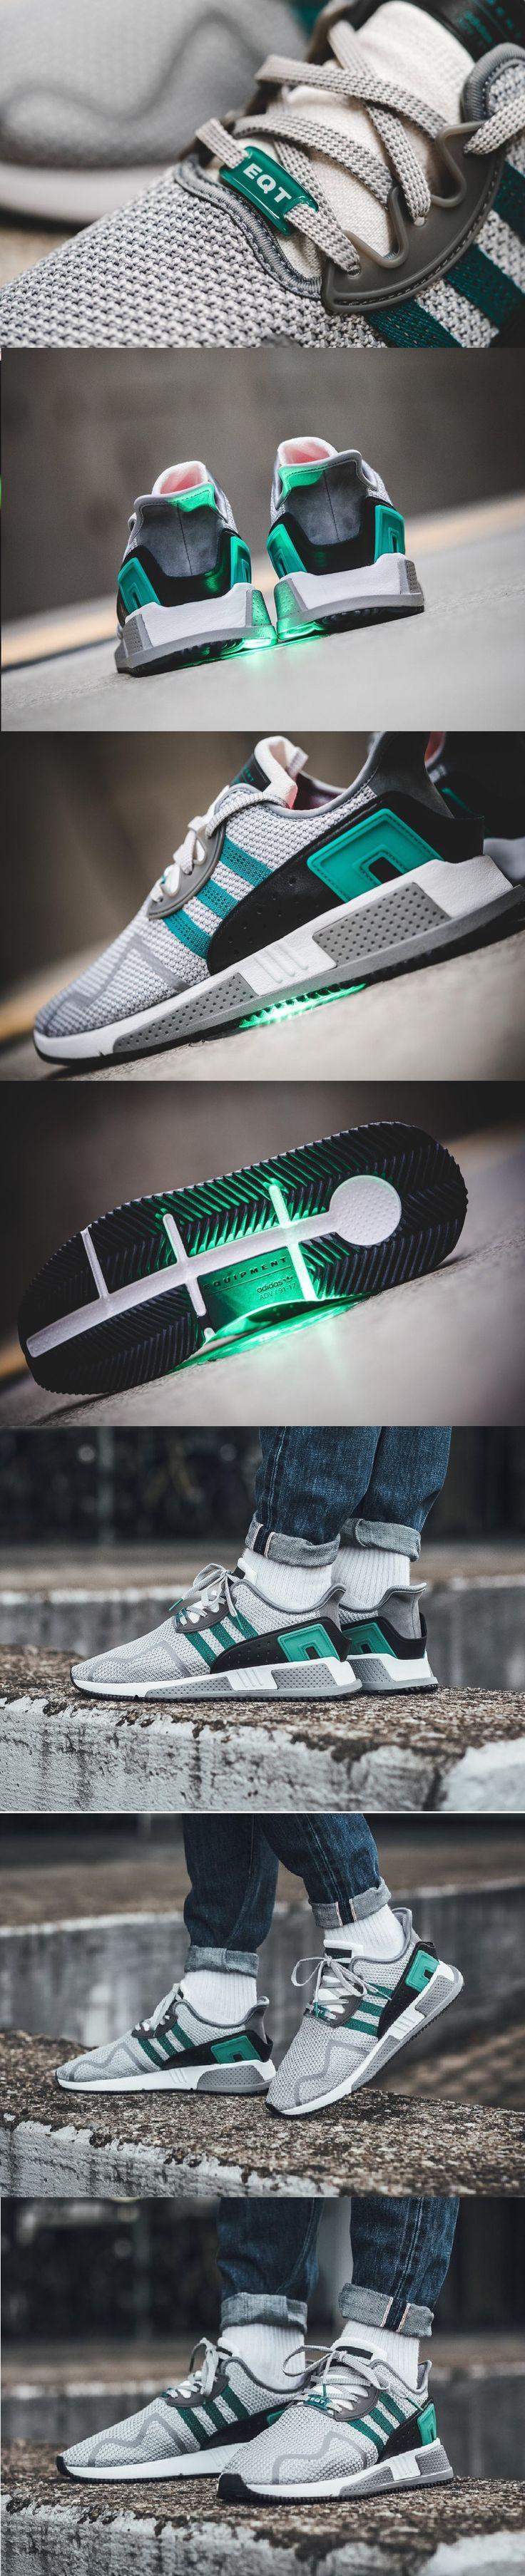 adidas EQT Support 91/17 Shoes Black adidas UK